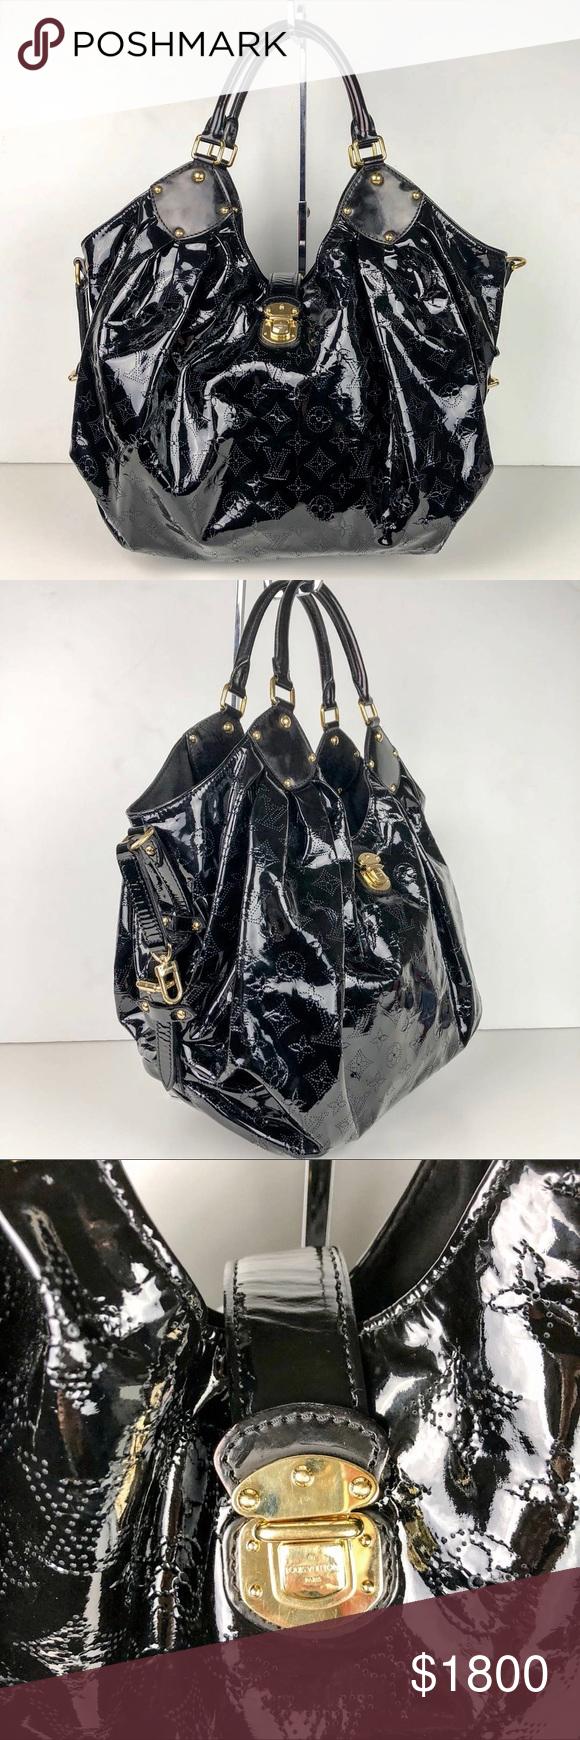 4d760f15d9b3 Louis Vuitton Mahina Surya XL Leather Satchel Tote Louis Vuitton Mahina  Surya XL Black Patent Leather